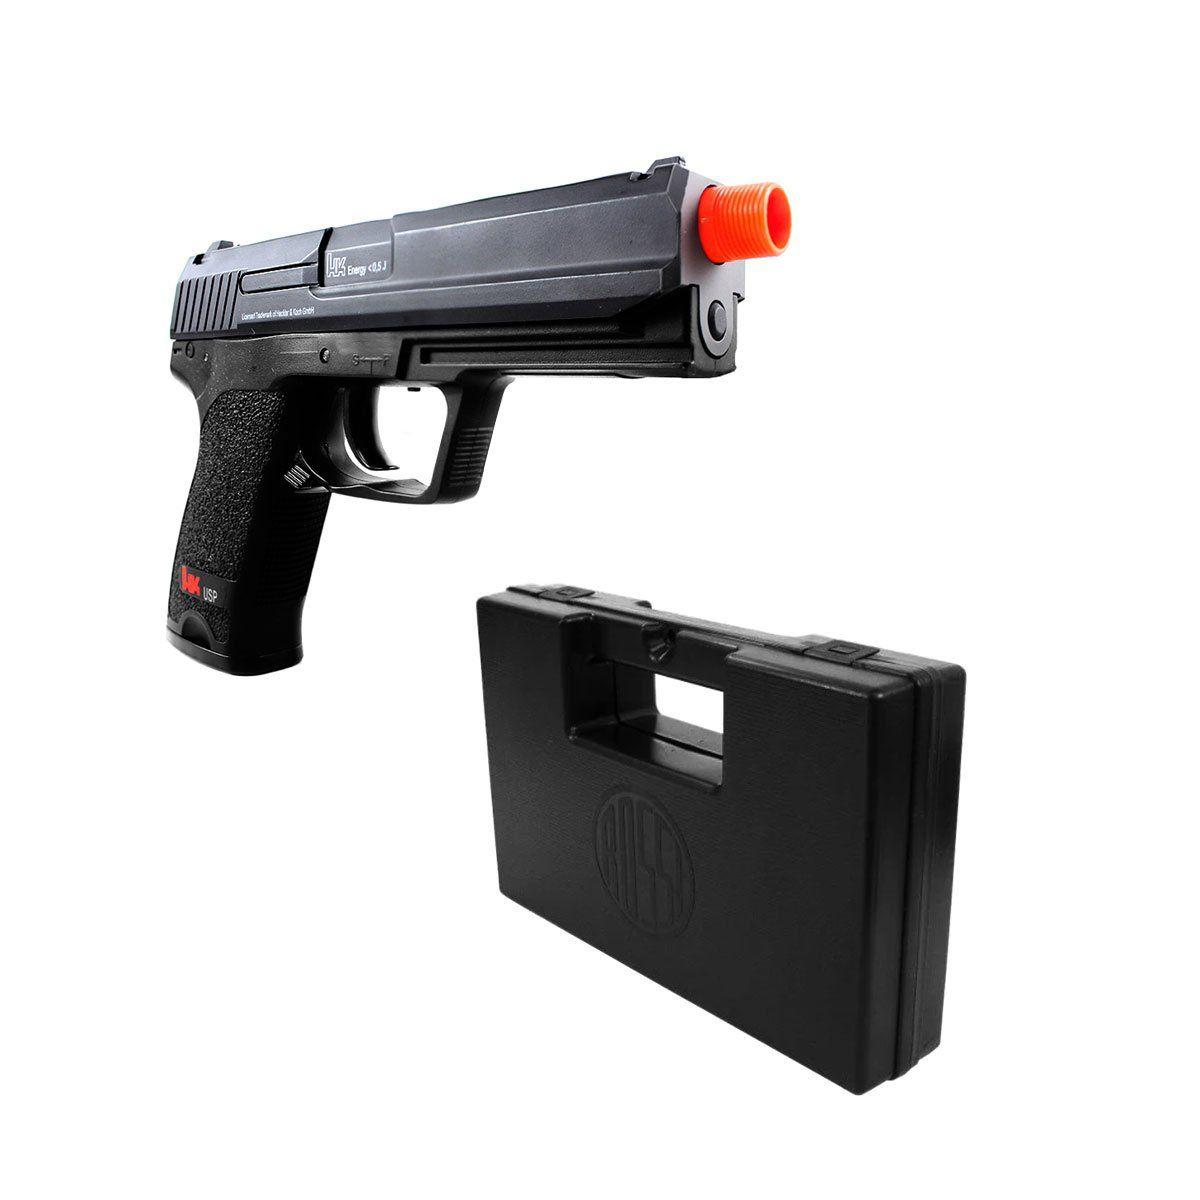 Pistola Airsoft Umarex H&K USP Tactical Slide Metal Elétrica + Maleta